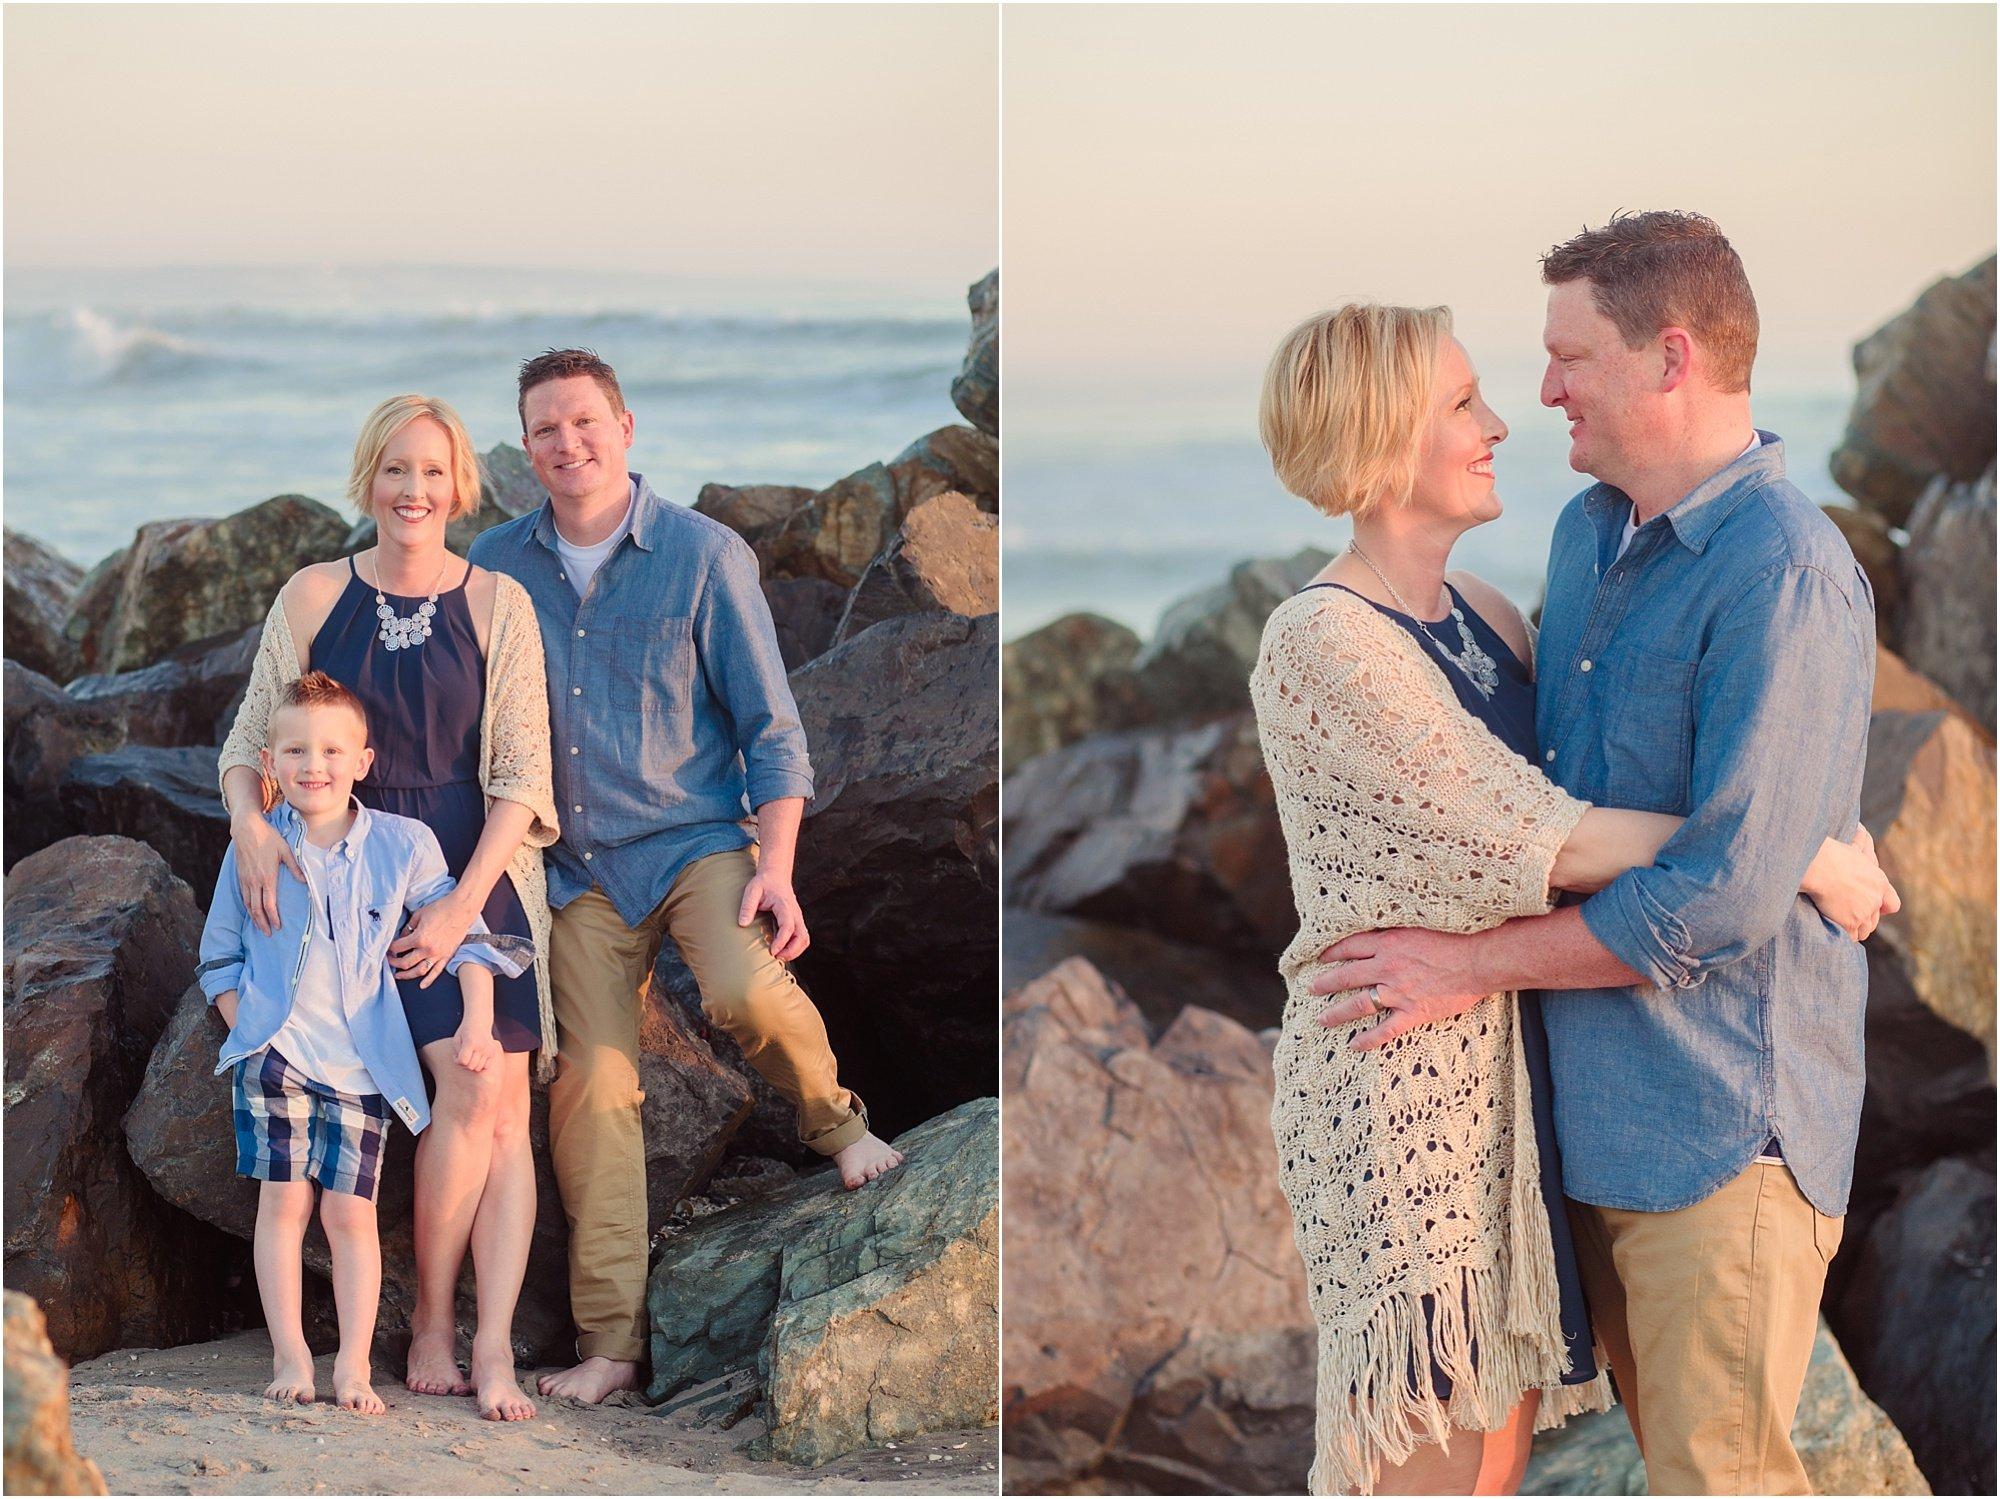 San Diego Child Photographer | San Diego Beach Portraits